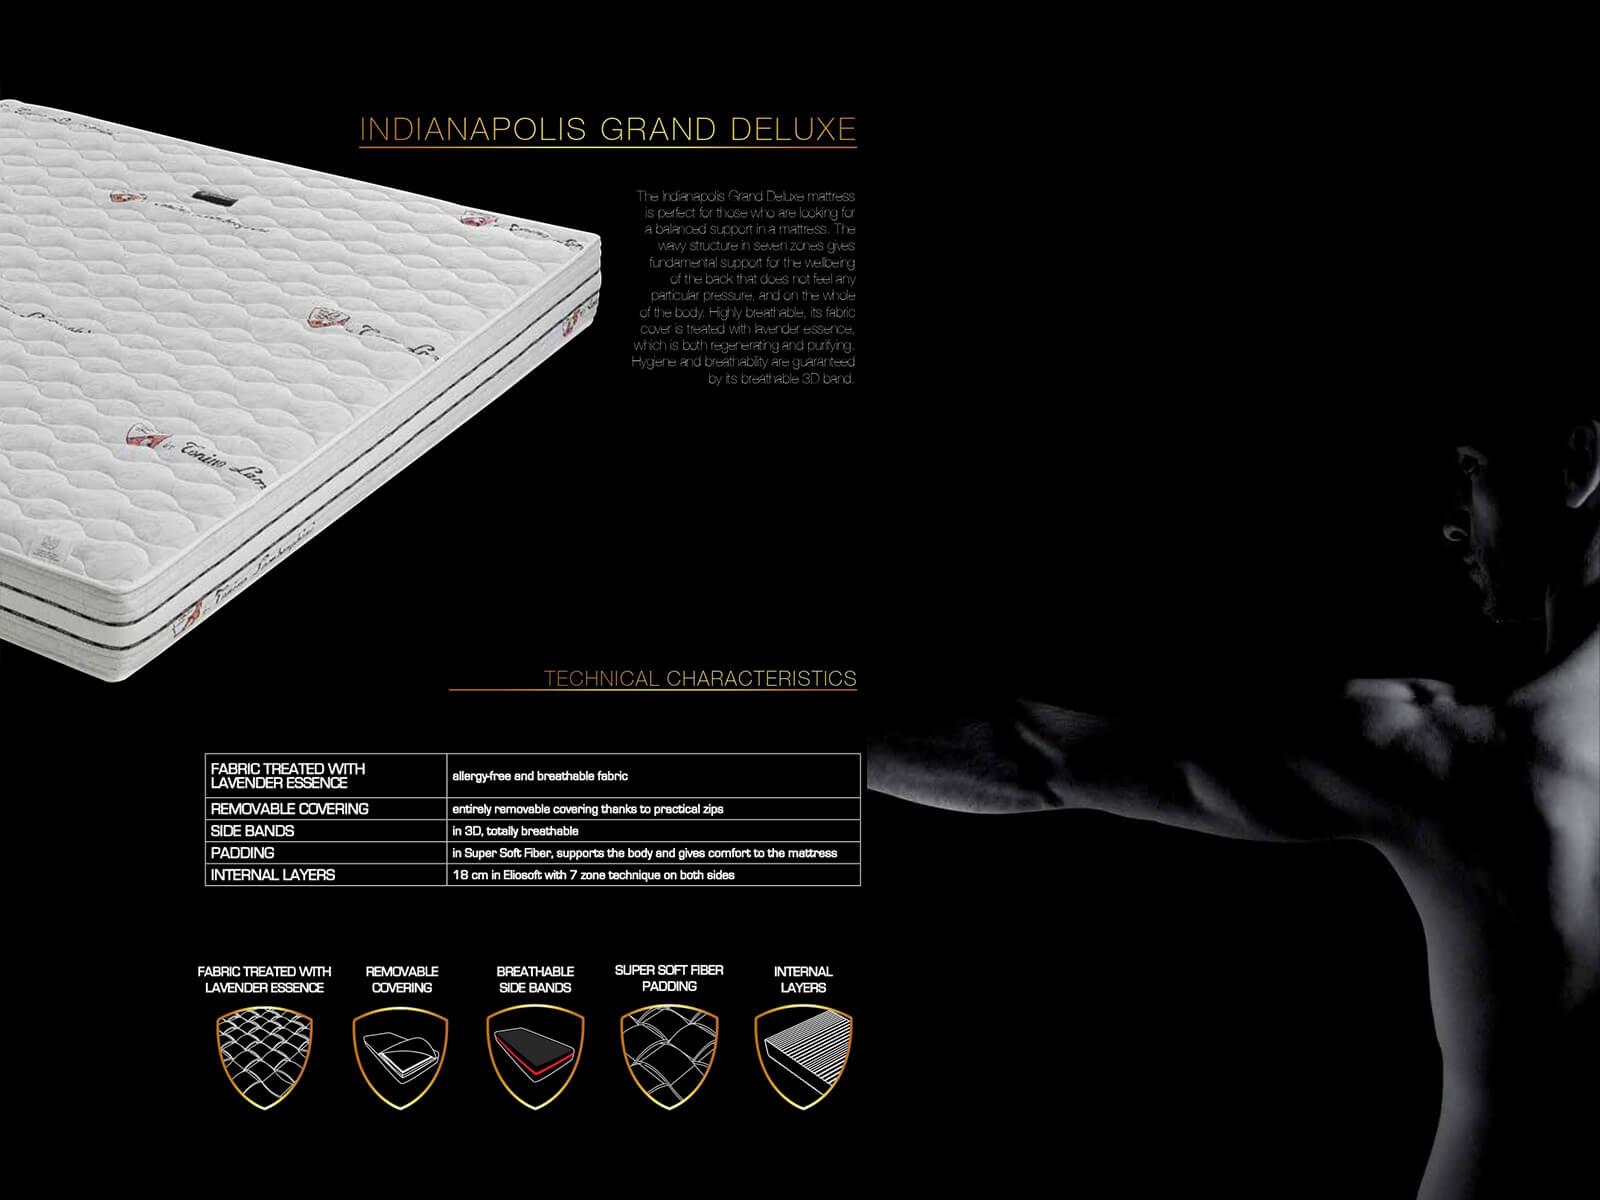 蘭博基尼mattress 義大利品牌 藍寶堅尼超跑床墊 INDIANAPOLIS GRAND DELUXE